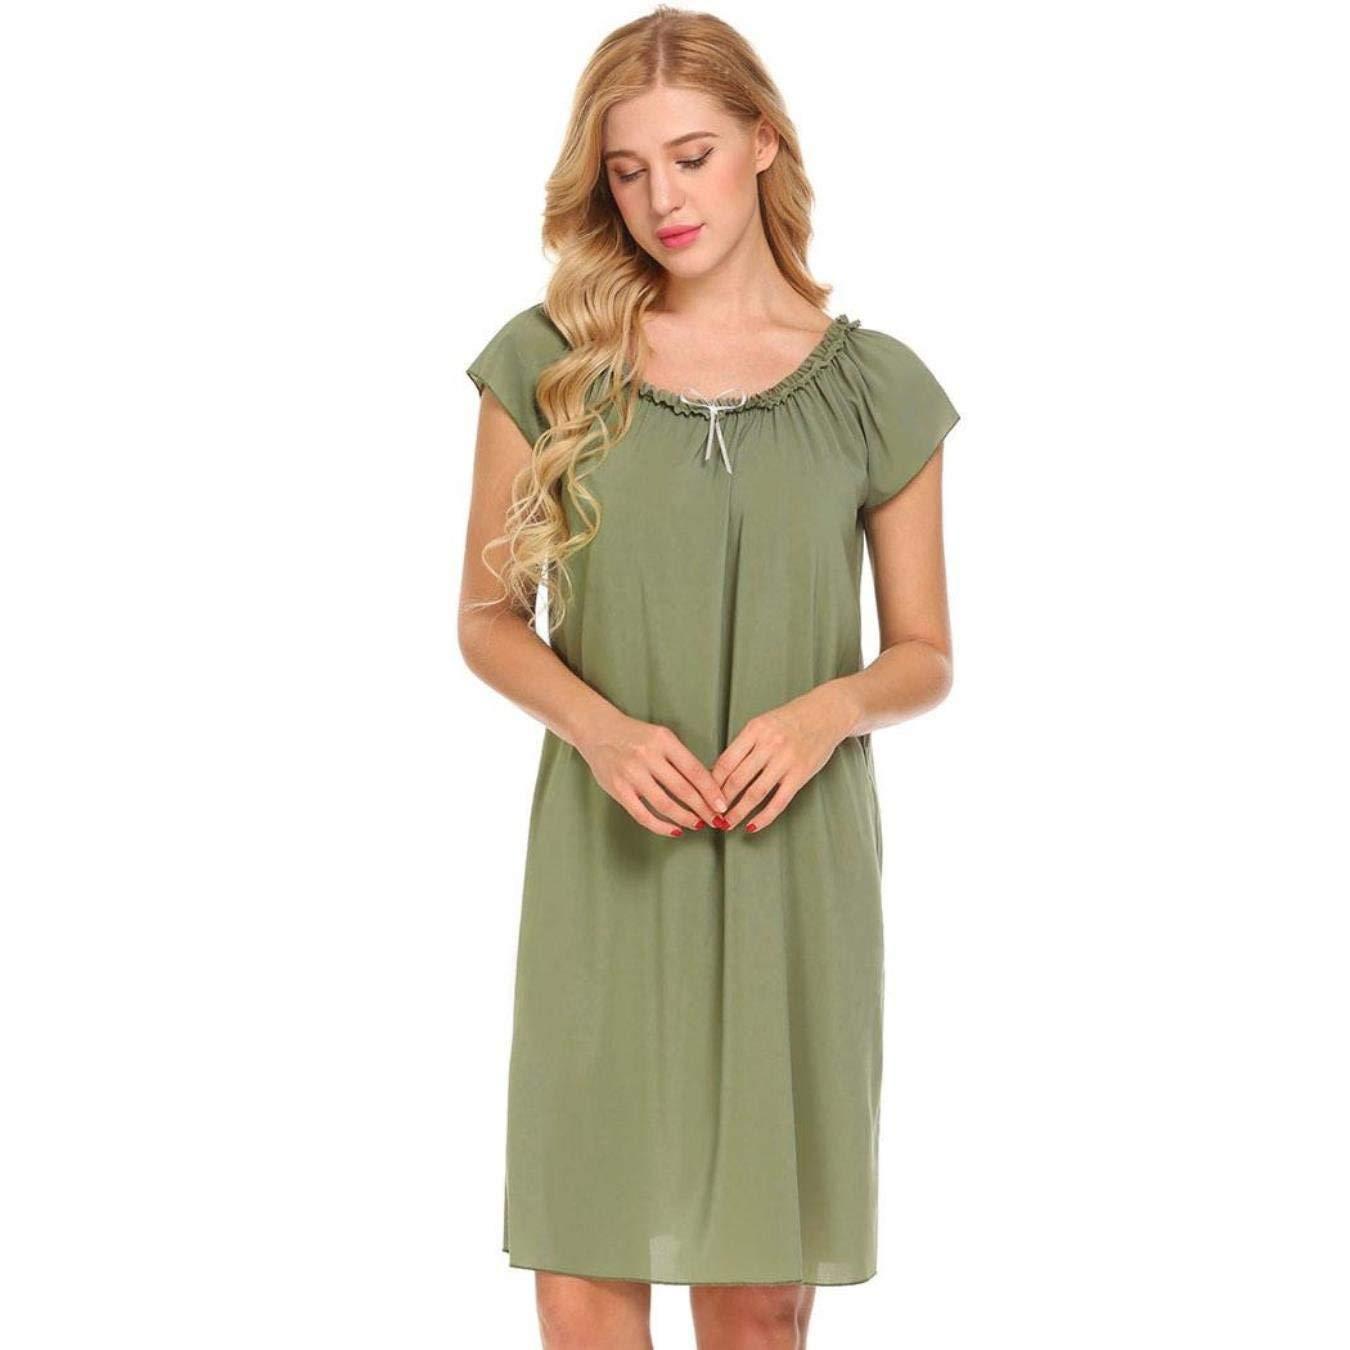 5fb8e3e8a9 NCOEM Casual Women Short Sleeve Sleepwear Ruffles Lounge Sleep Dress Solid  Loose Chiffon Nightgown Female Nightwear